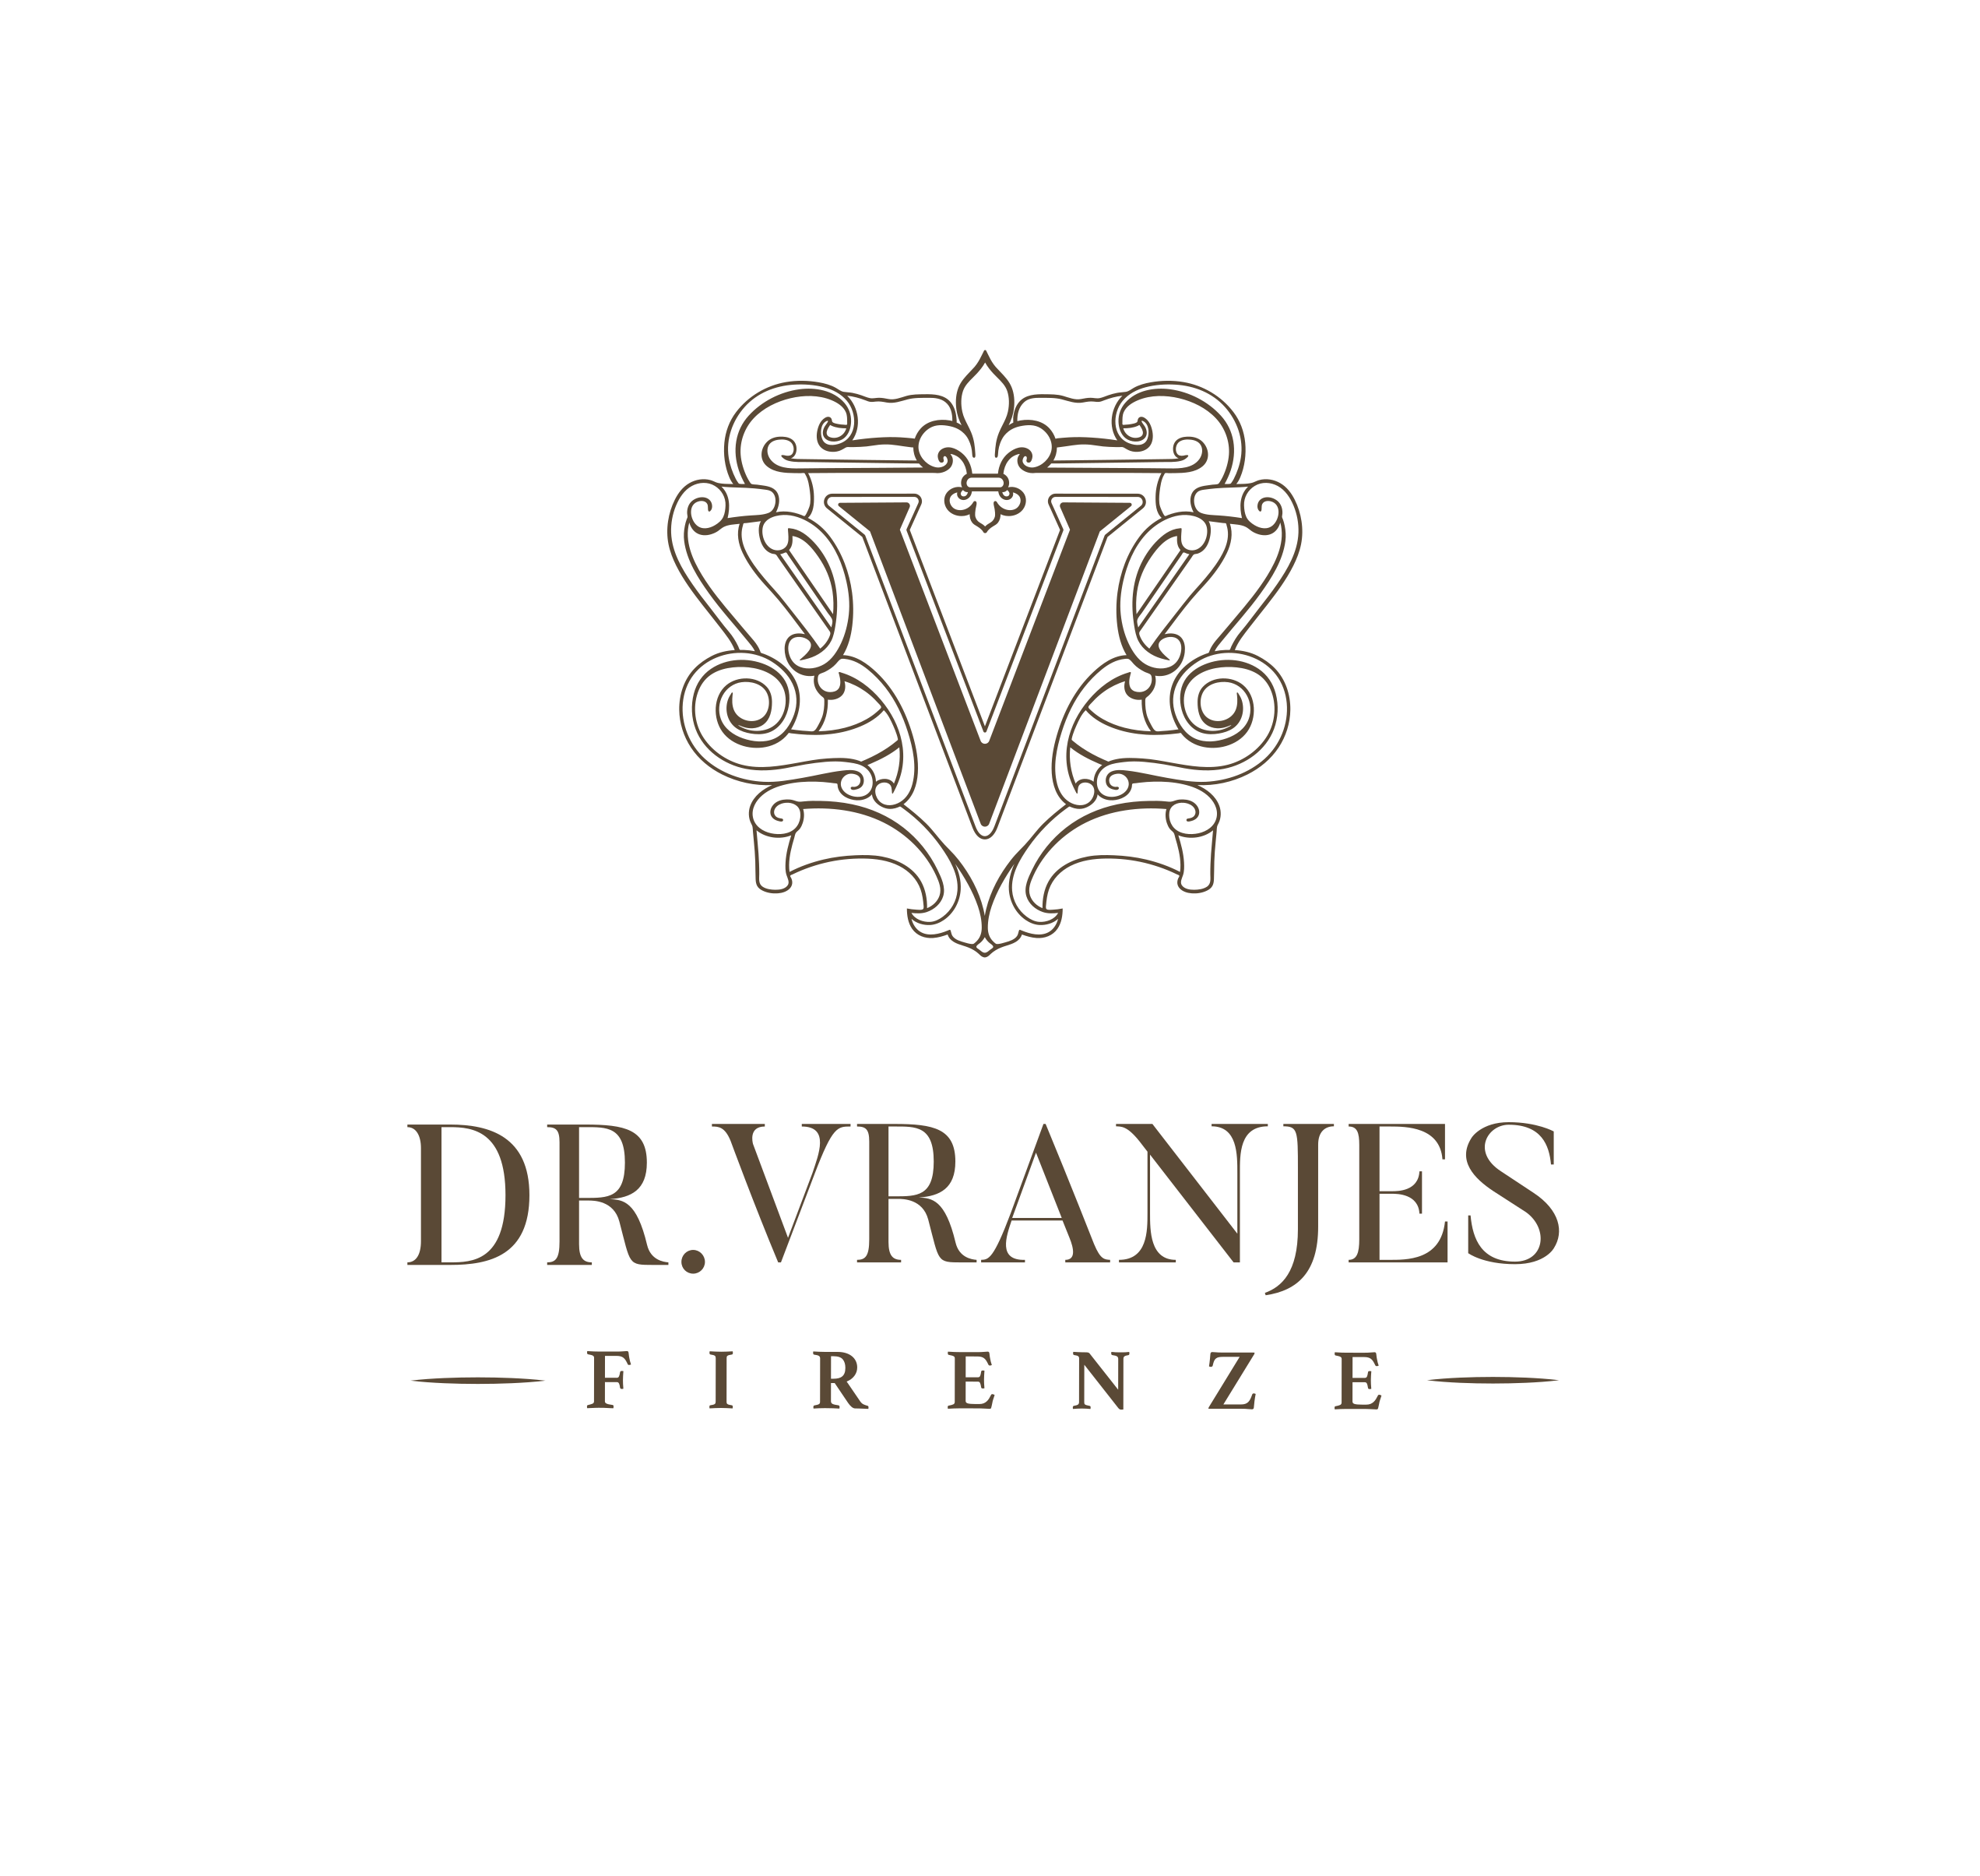 Dr. Vranjes Firenze